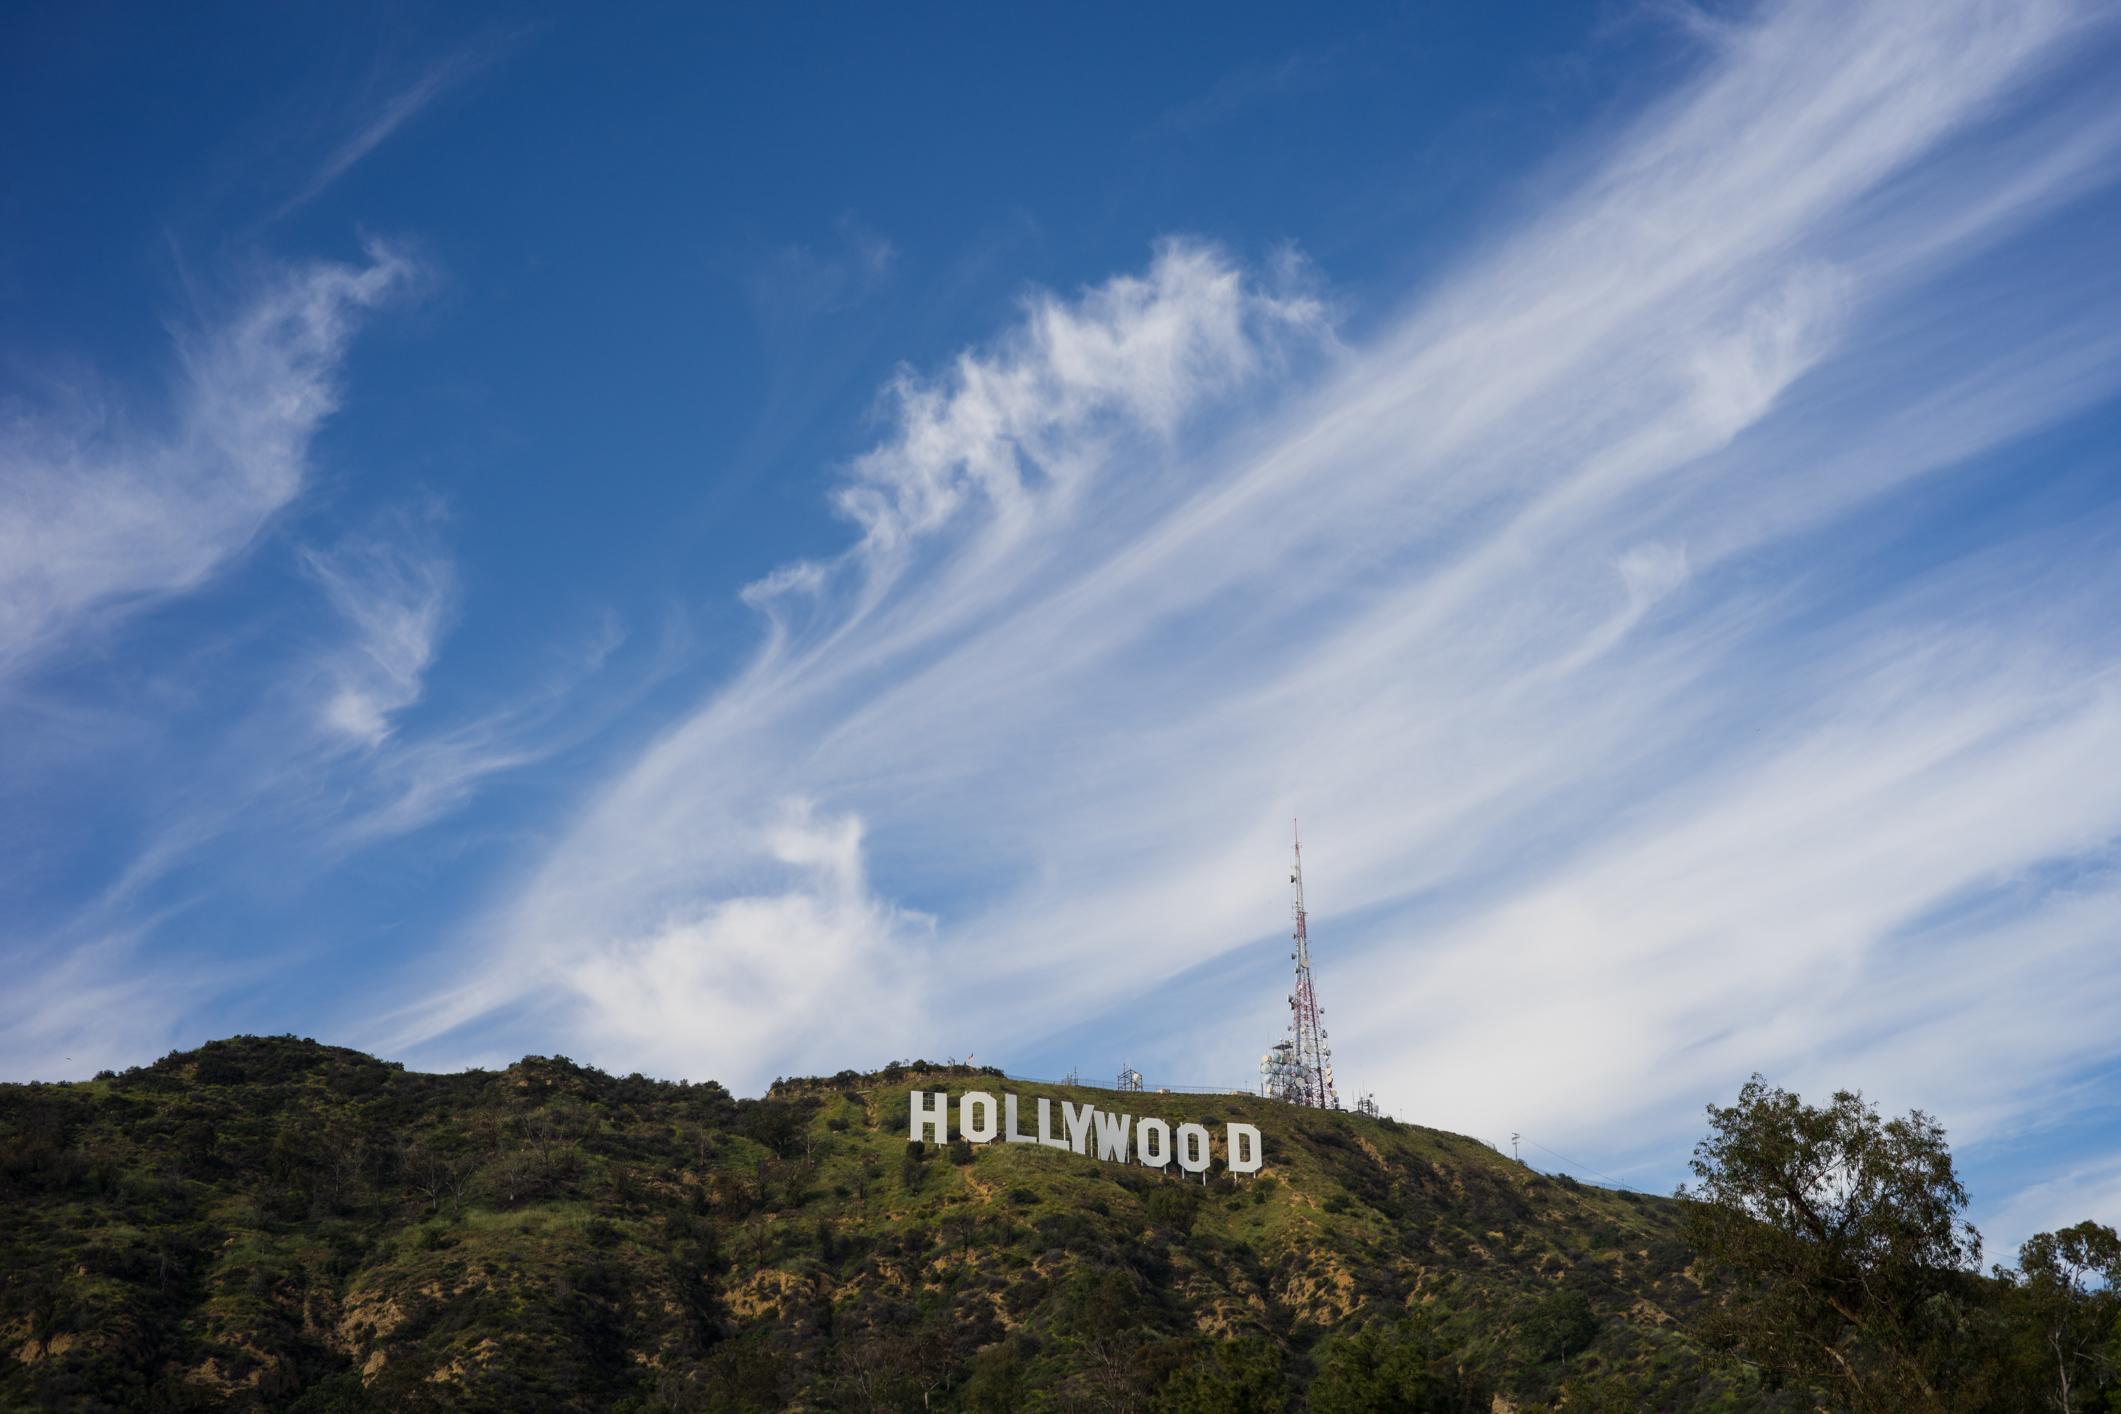 LA-Hollywood-sign-clouds.jpg